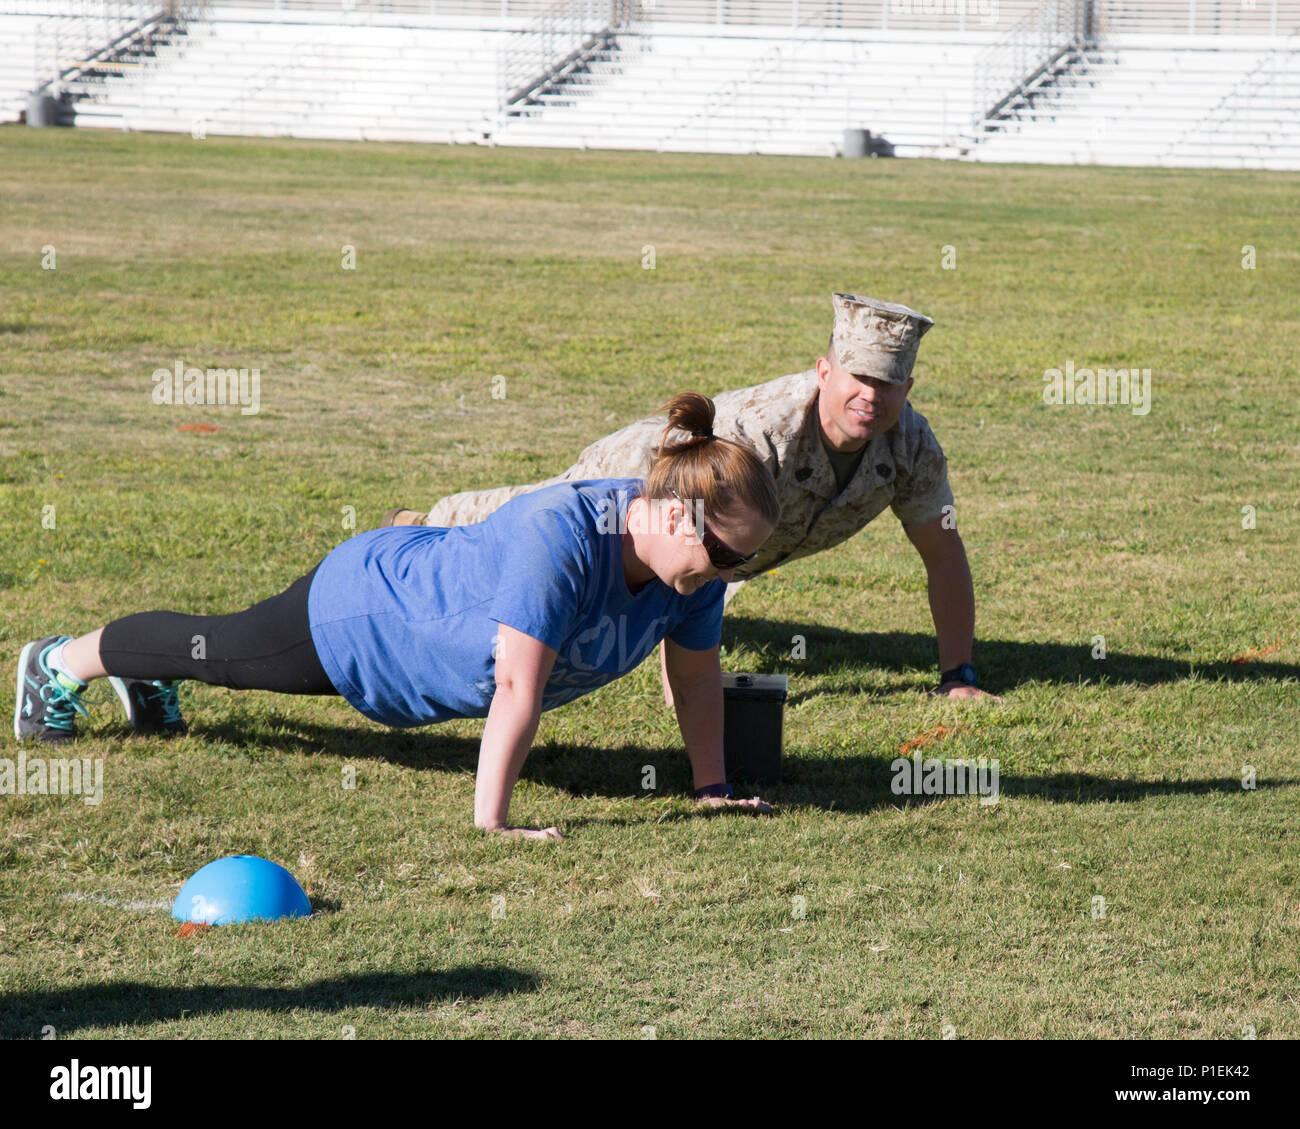 amanda roselli demonstrates perfect push up form as her husband